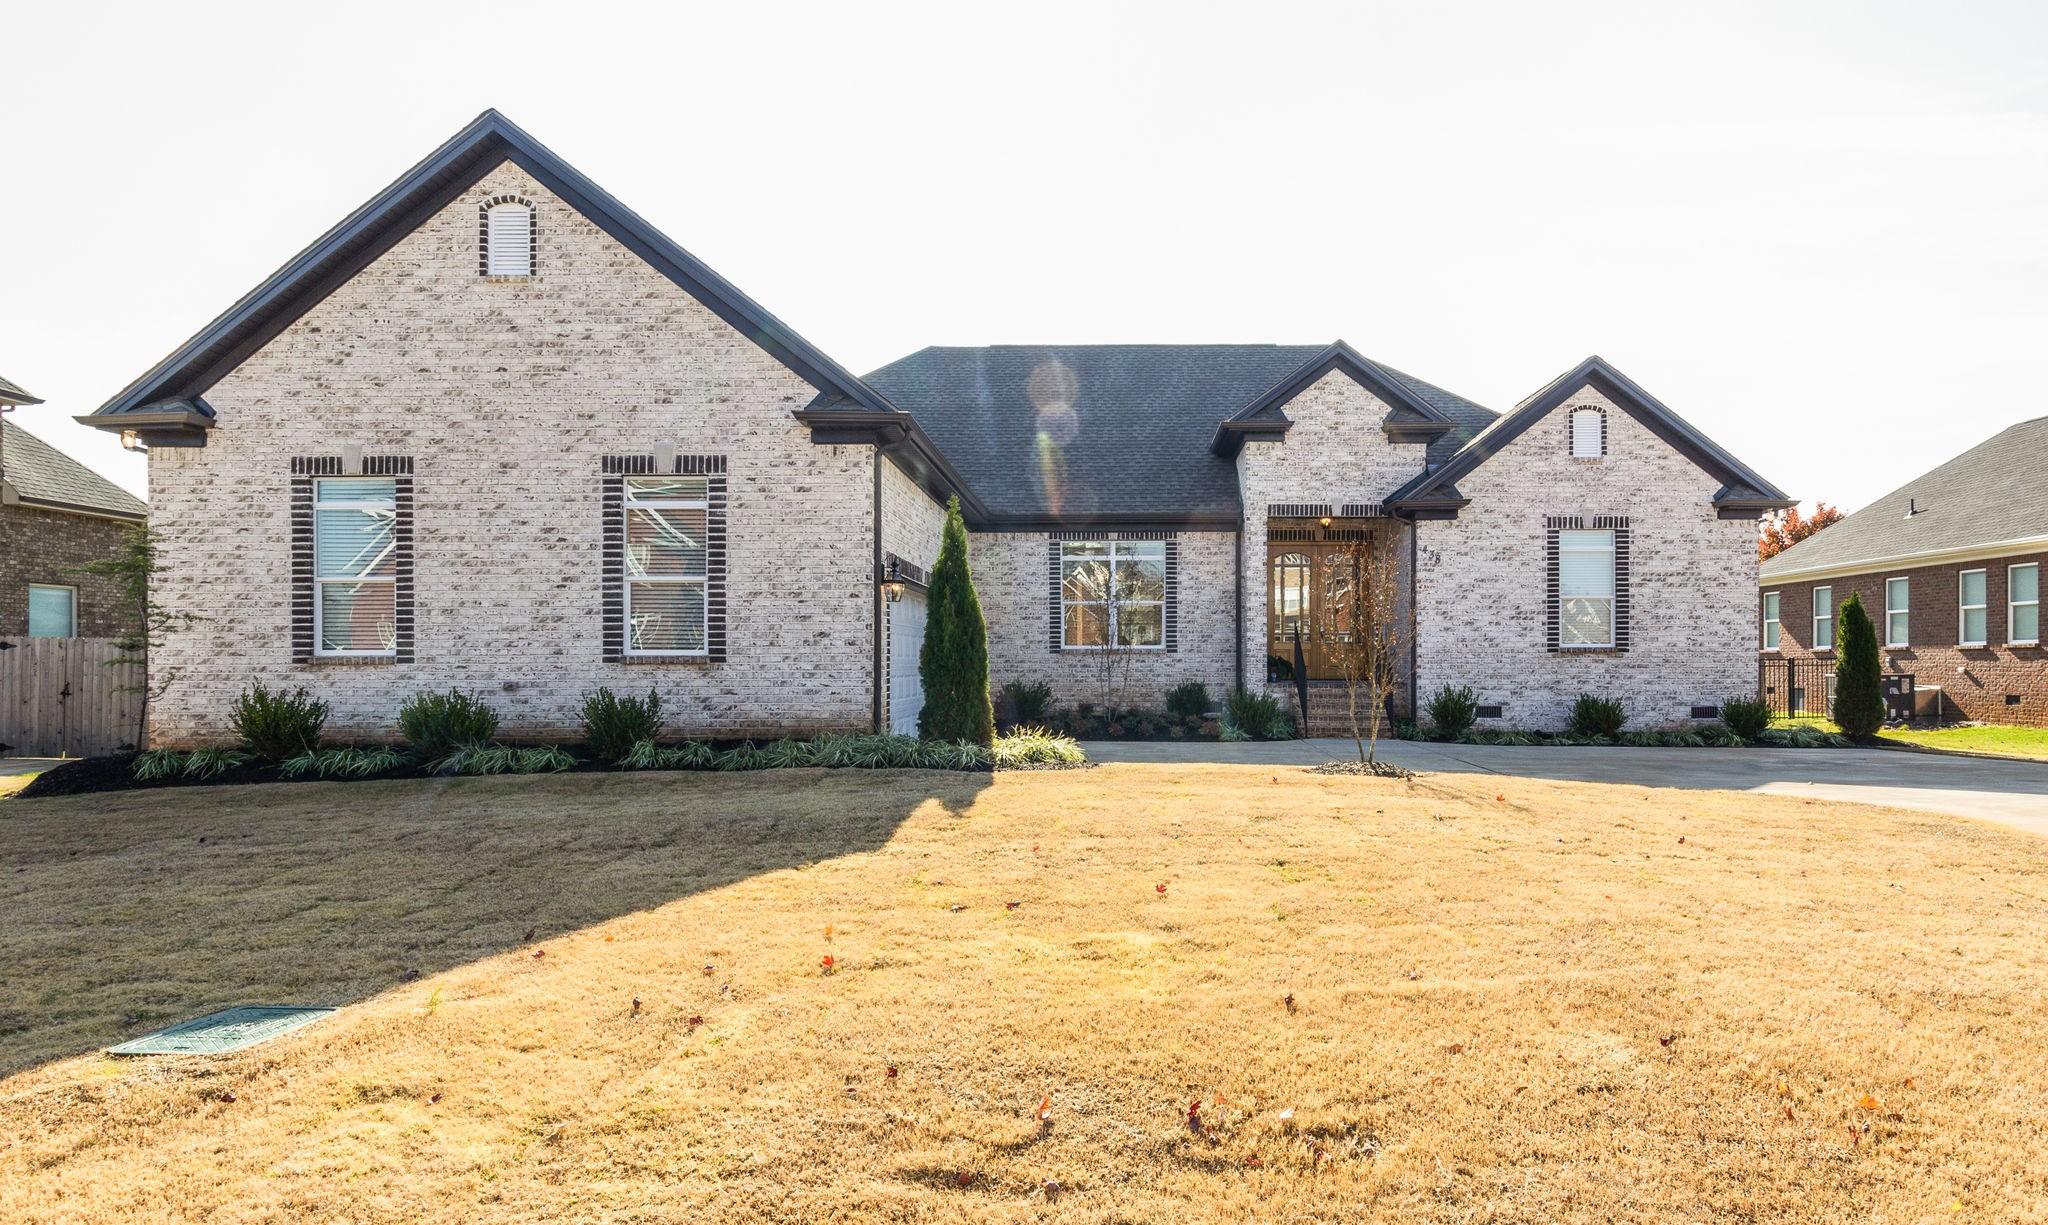 438 Paul Norman Dr, Murfreesboro, TN 37127 - Murfreesboro, TN real estate listing